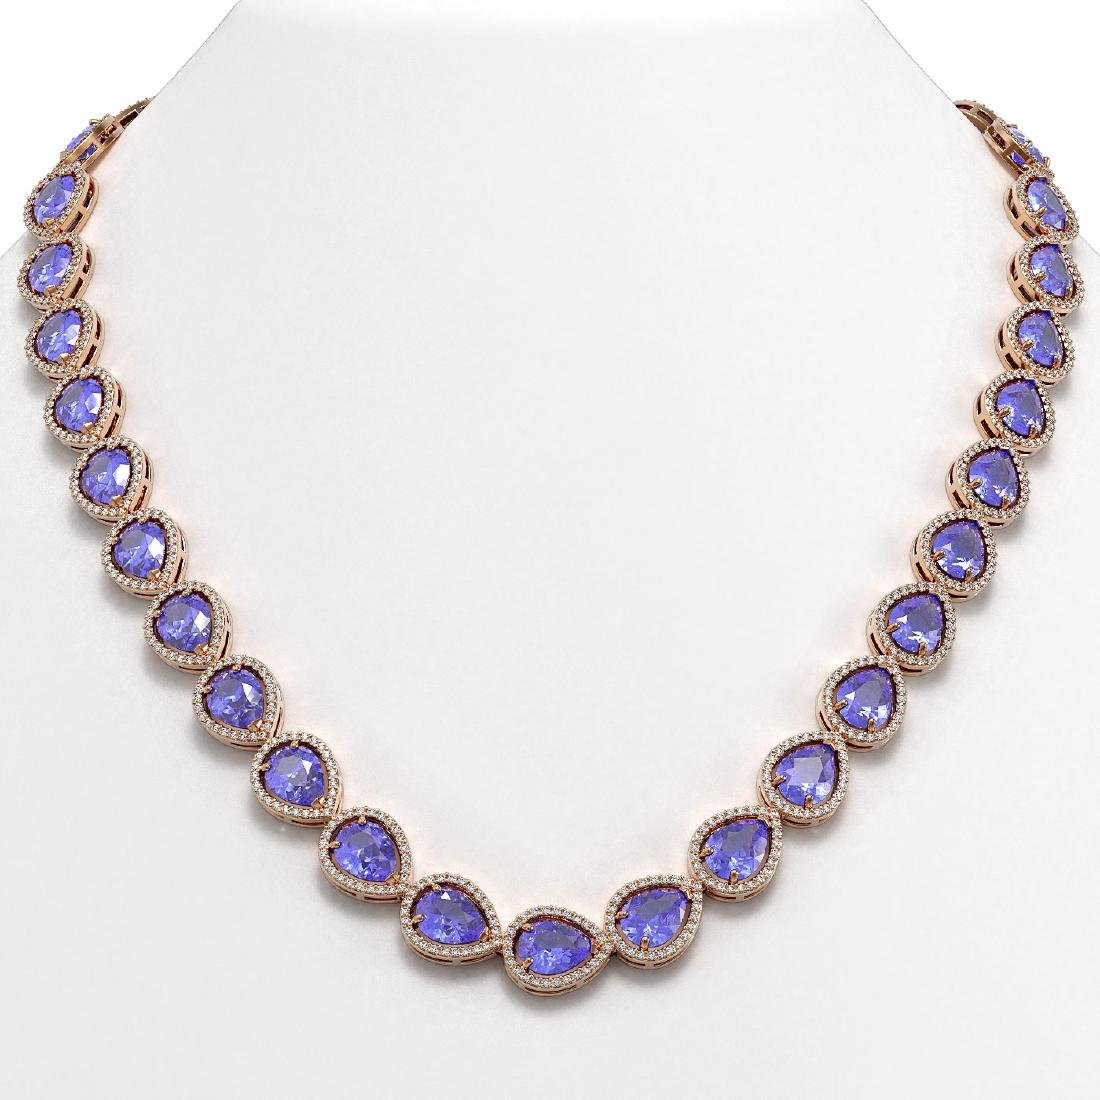 44.8 CTW Tanzanite & Diamond Halo Necklace 10K Rose